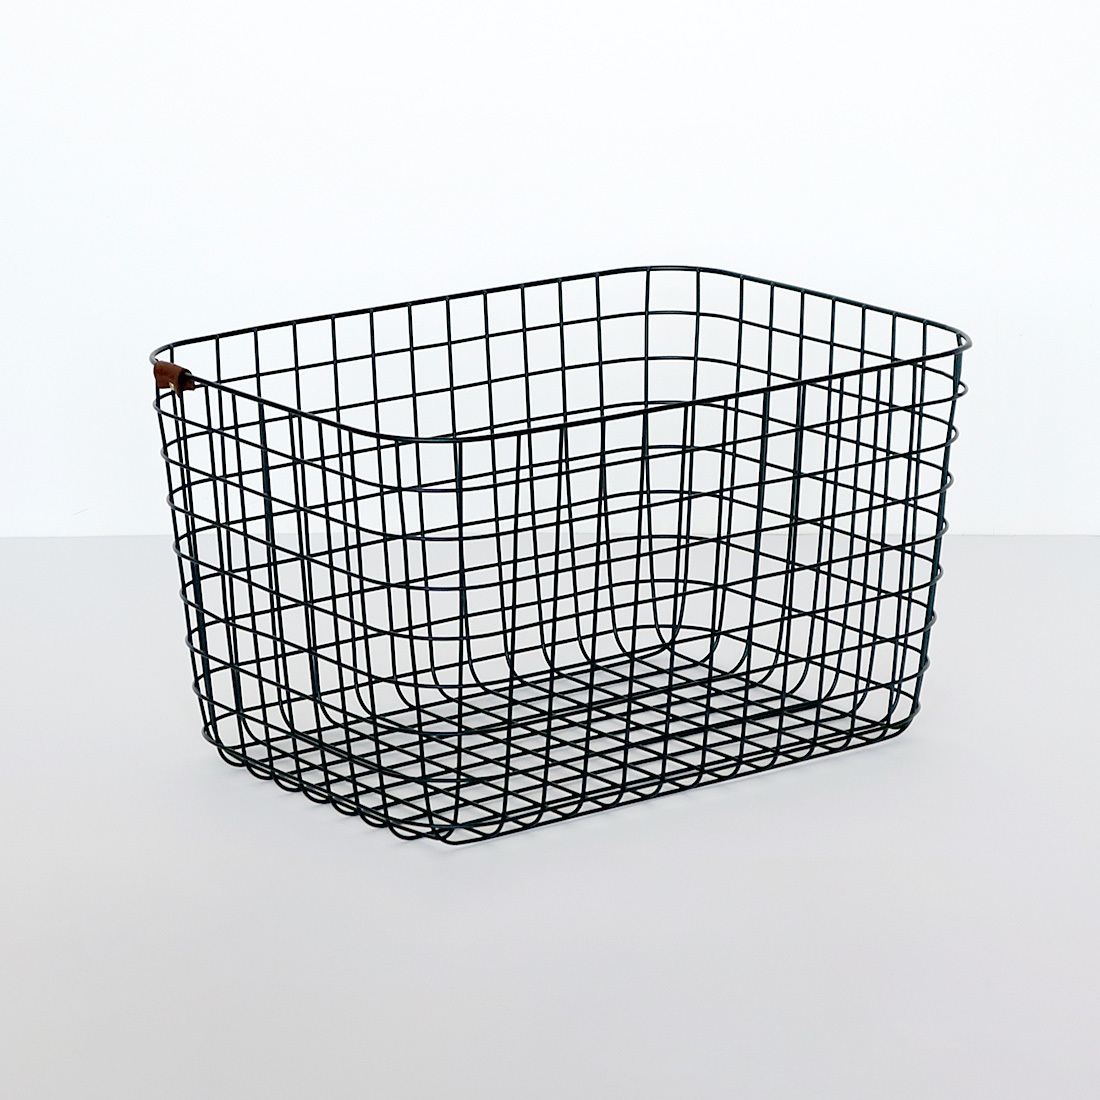 【MOHEIM】 WIRE BASKET (L / black) ブラック ワイヤーバスケット 収納 カゴ インテリア